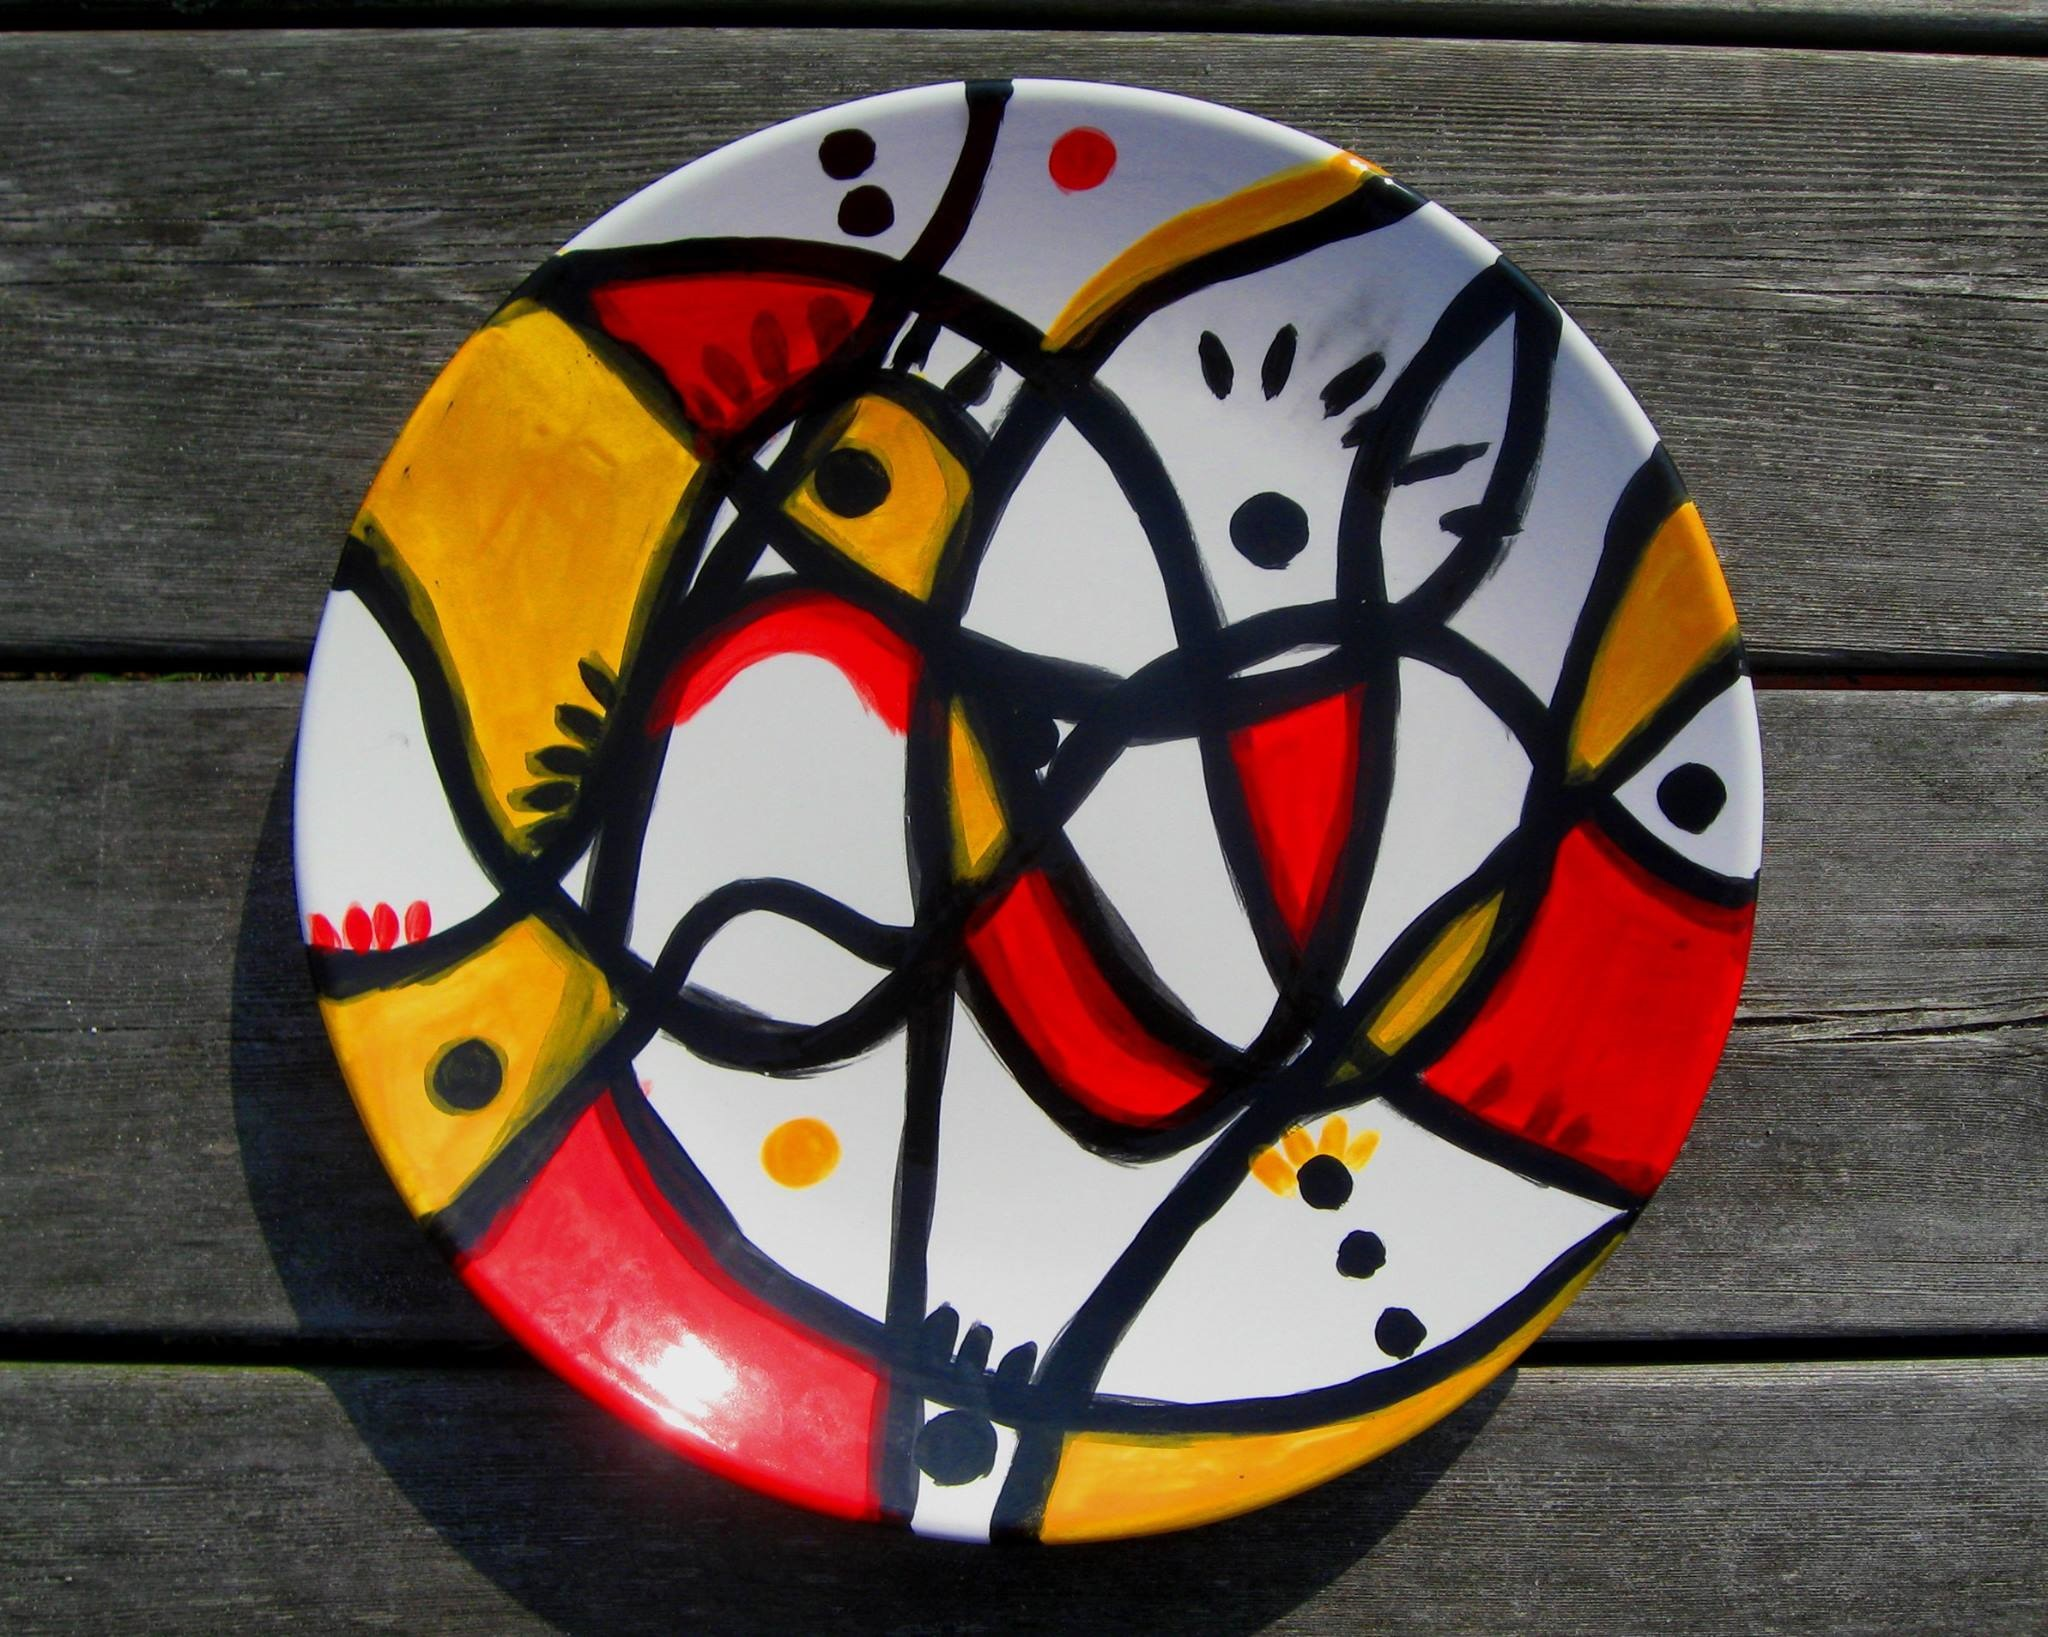 Plate No. 1